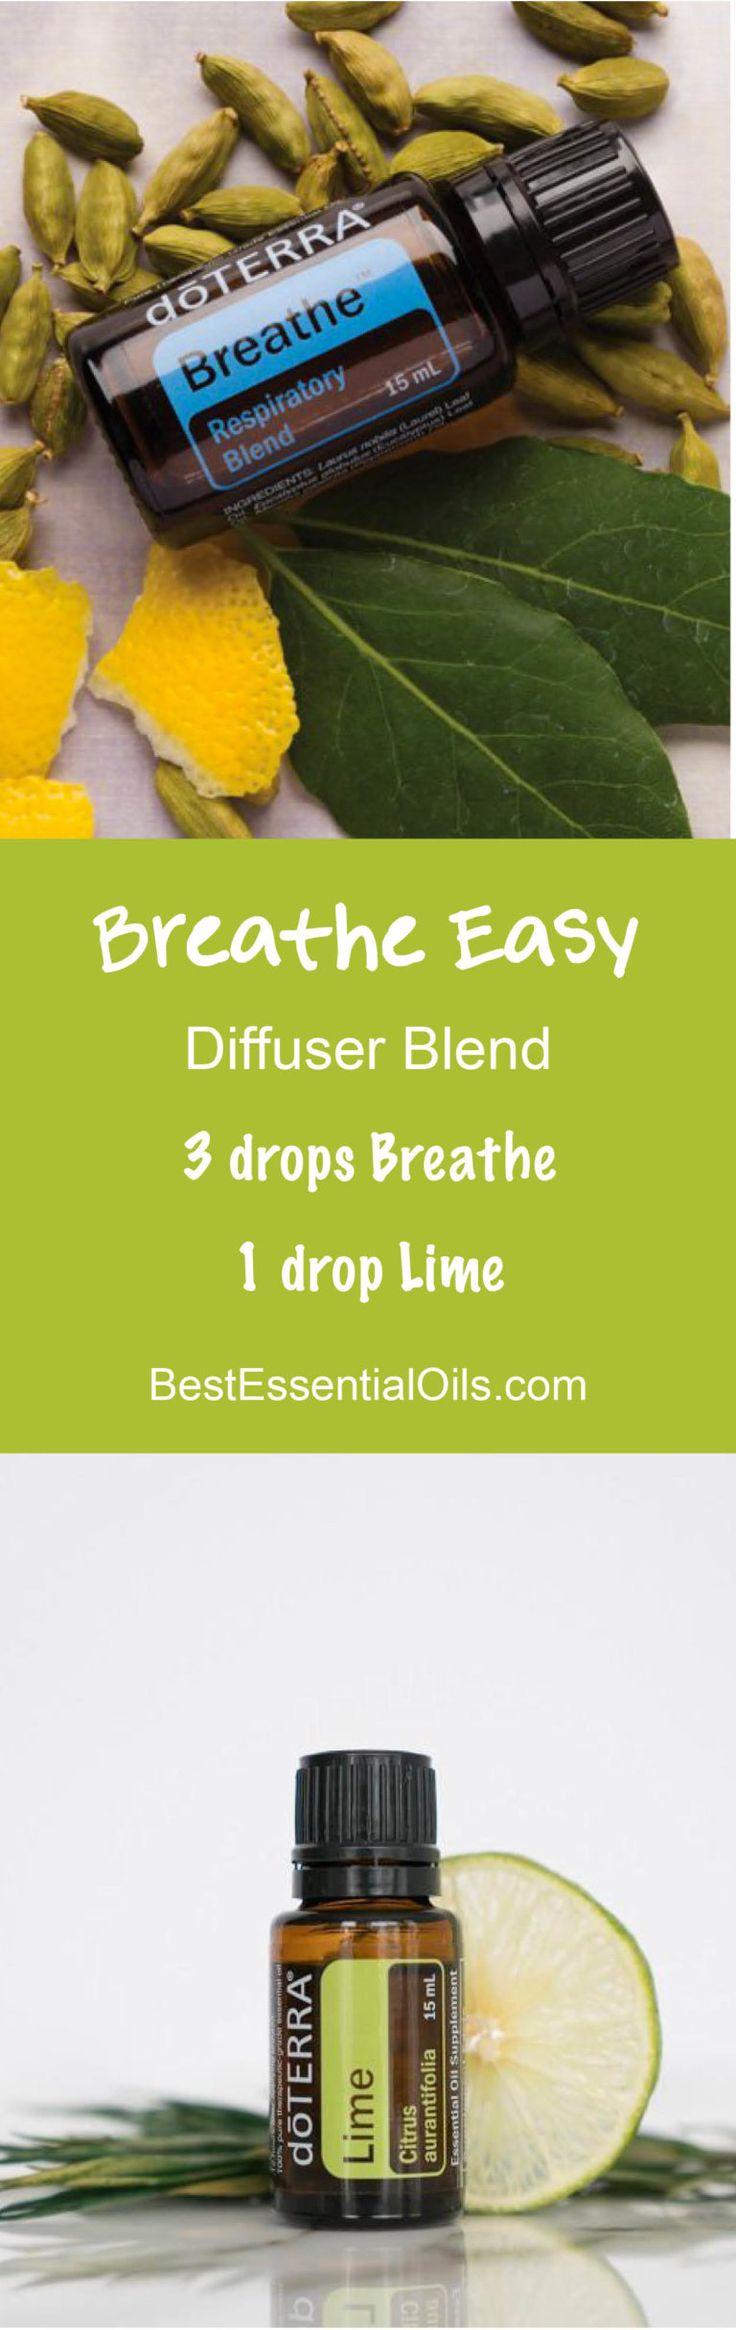 Breathe Easy doTERRA Diffuser Blend